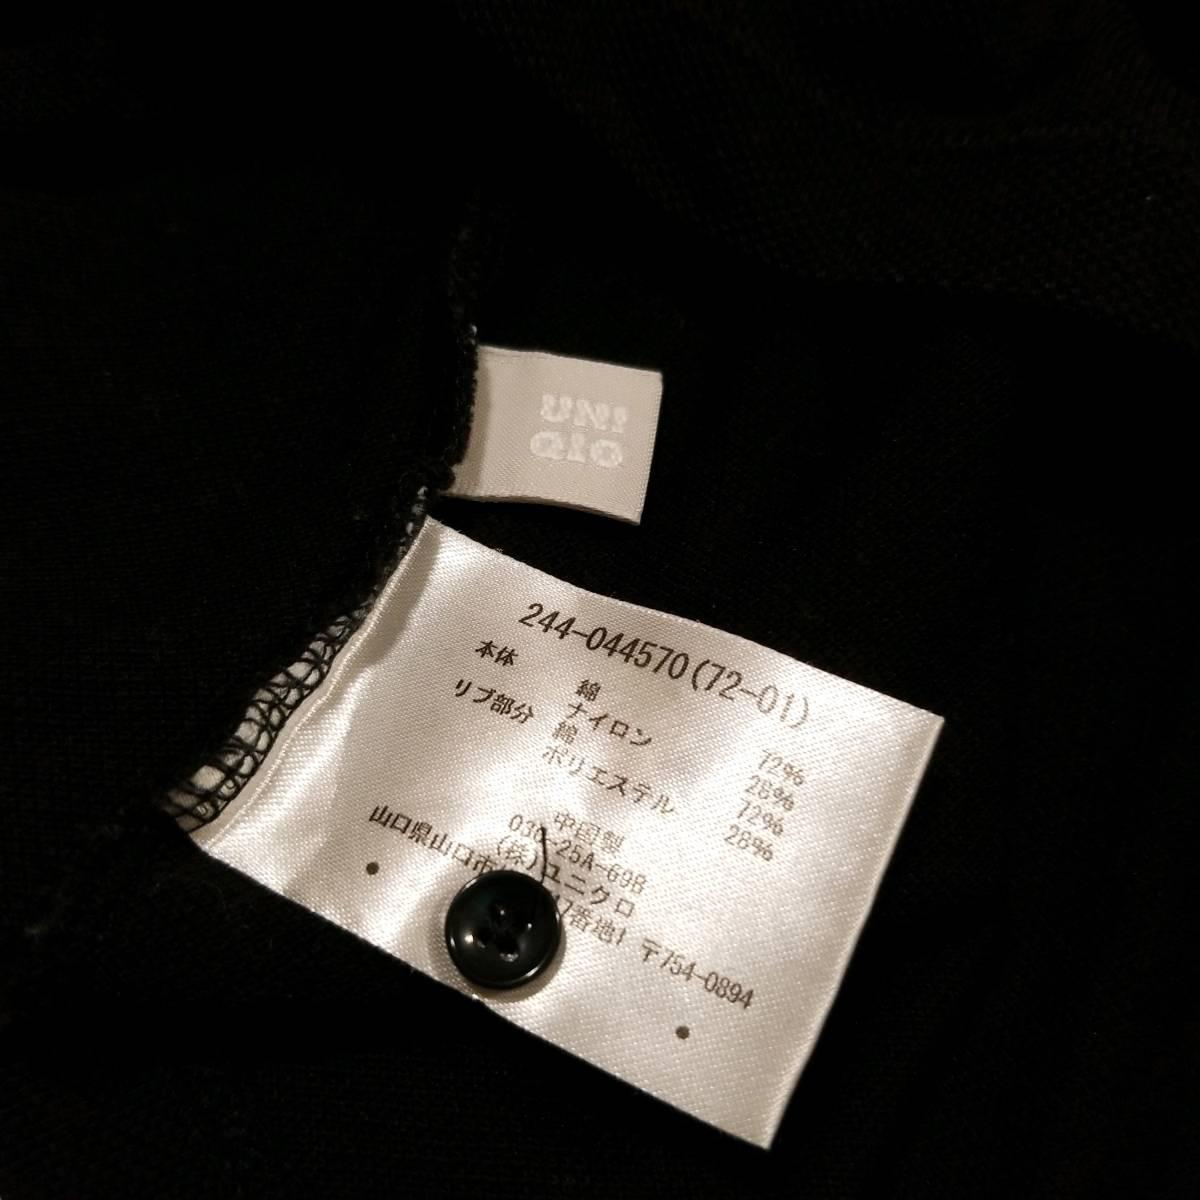 H814 UNIQLO ユニクロ Tシャツ ワンピース M レディース ポロシャツ チュニック 半袖 ショートスリーブ 黒系 ブラック系 無地 ..